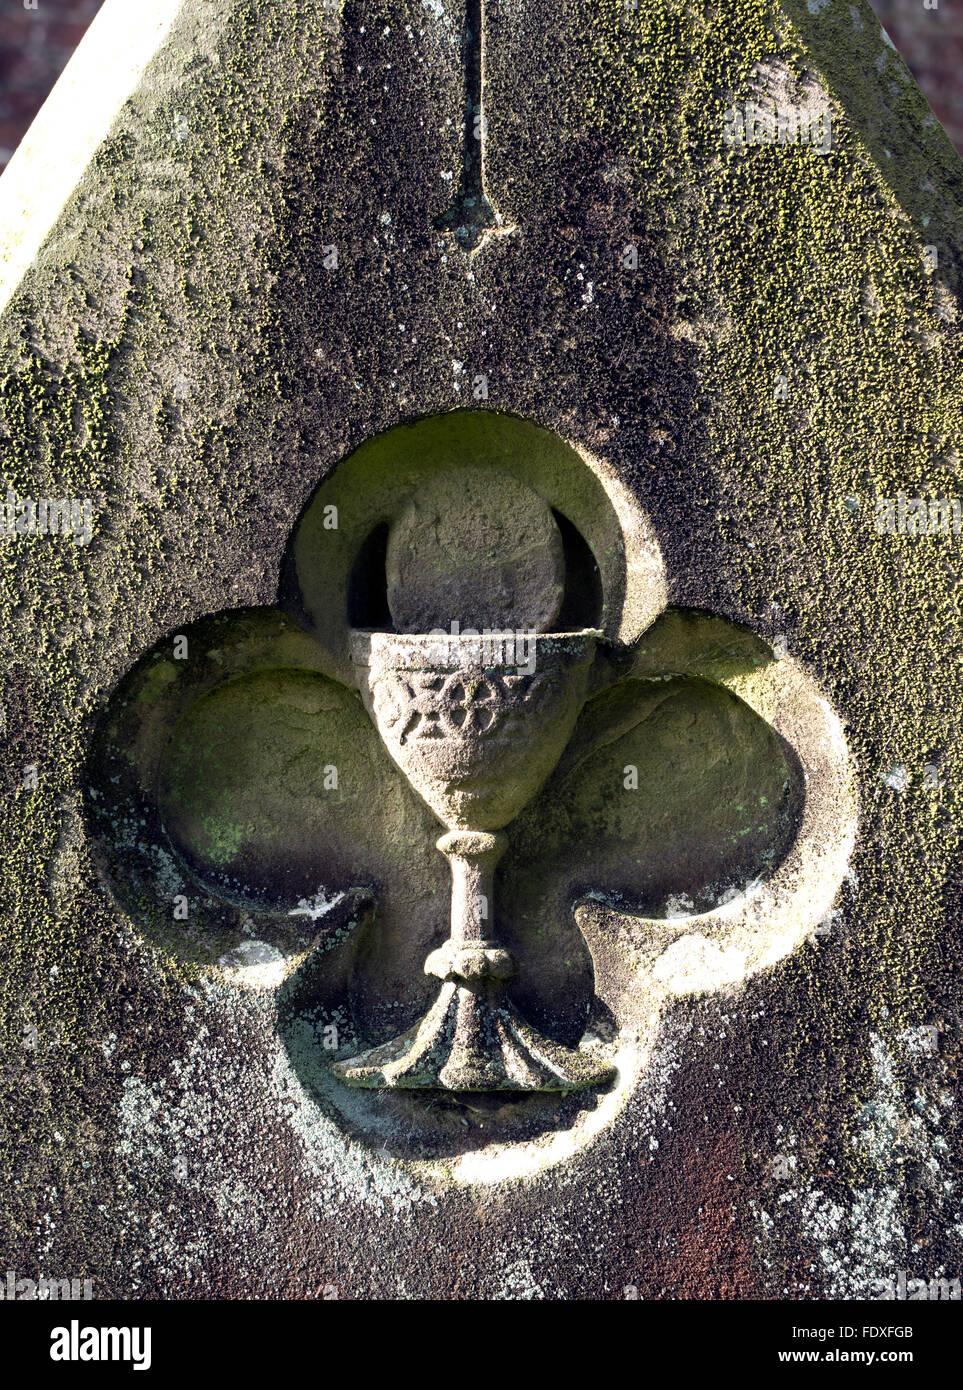 Chalice detail on gravestone - Stock Image